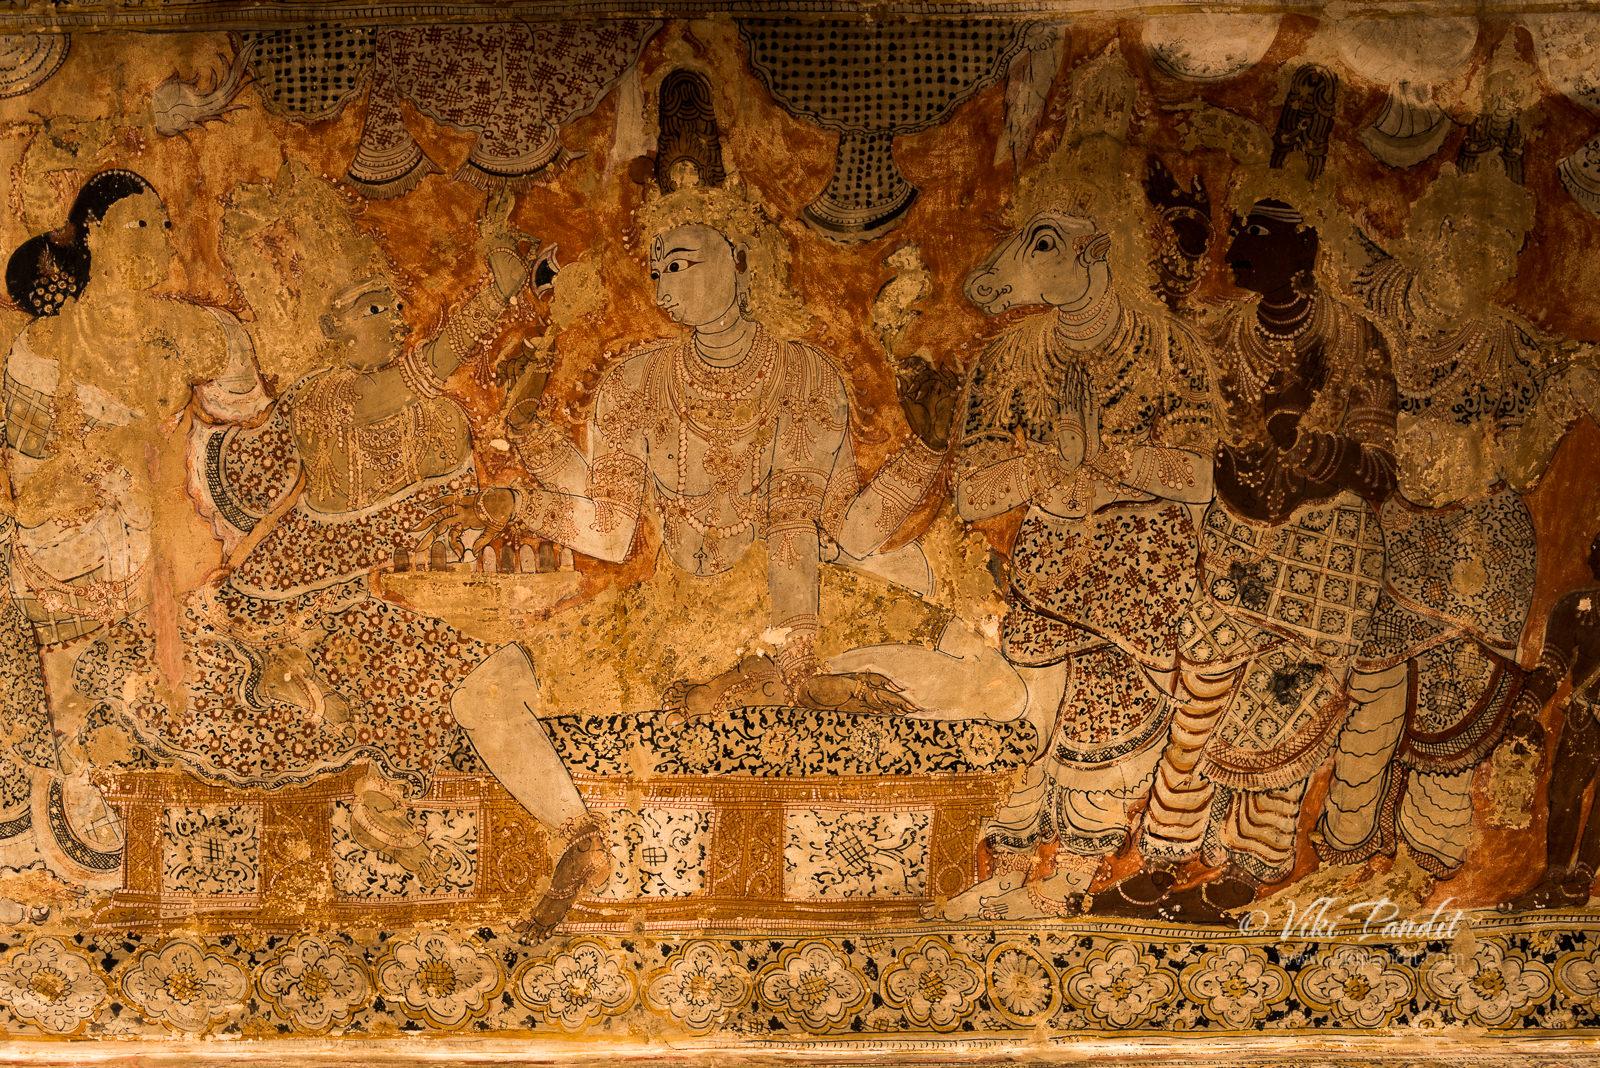 Shiva Marriage Ceremony in ceiling paintings, Veerabhadra Temple